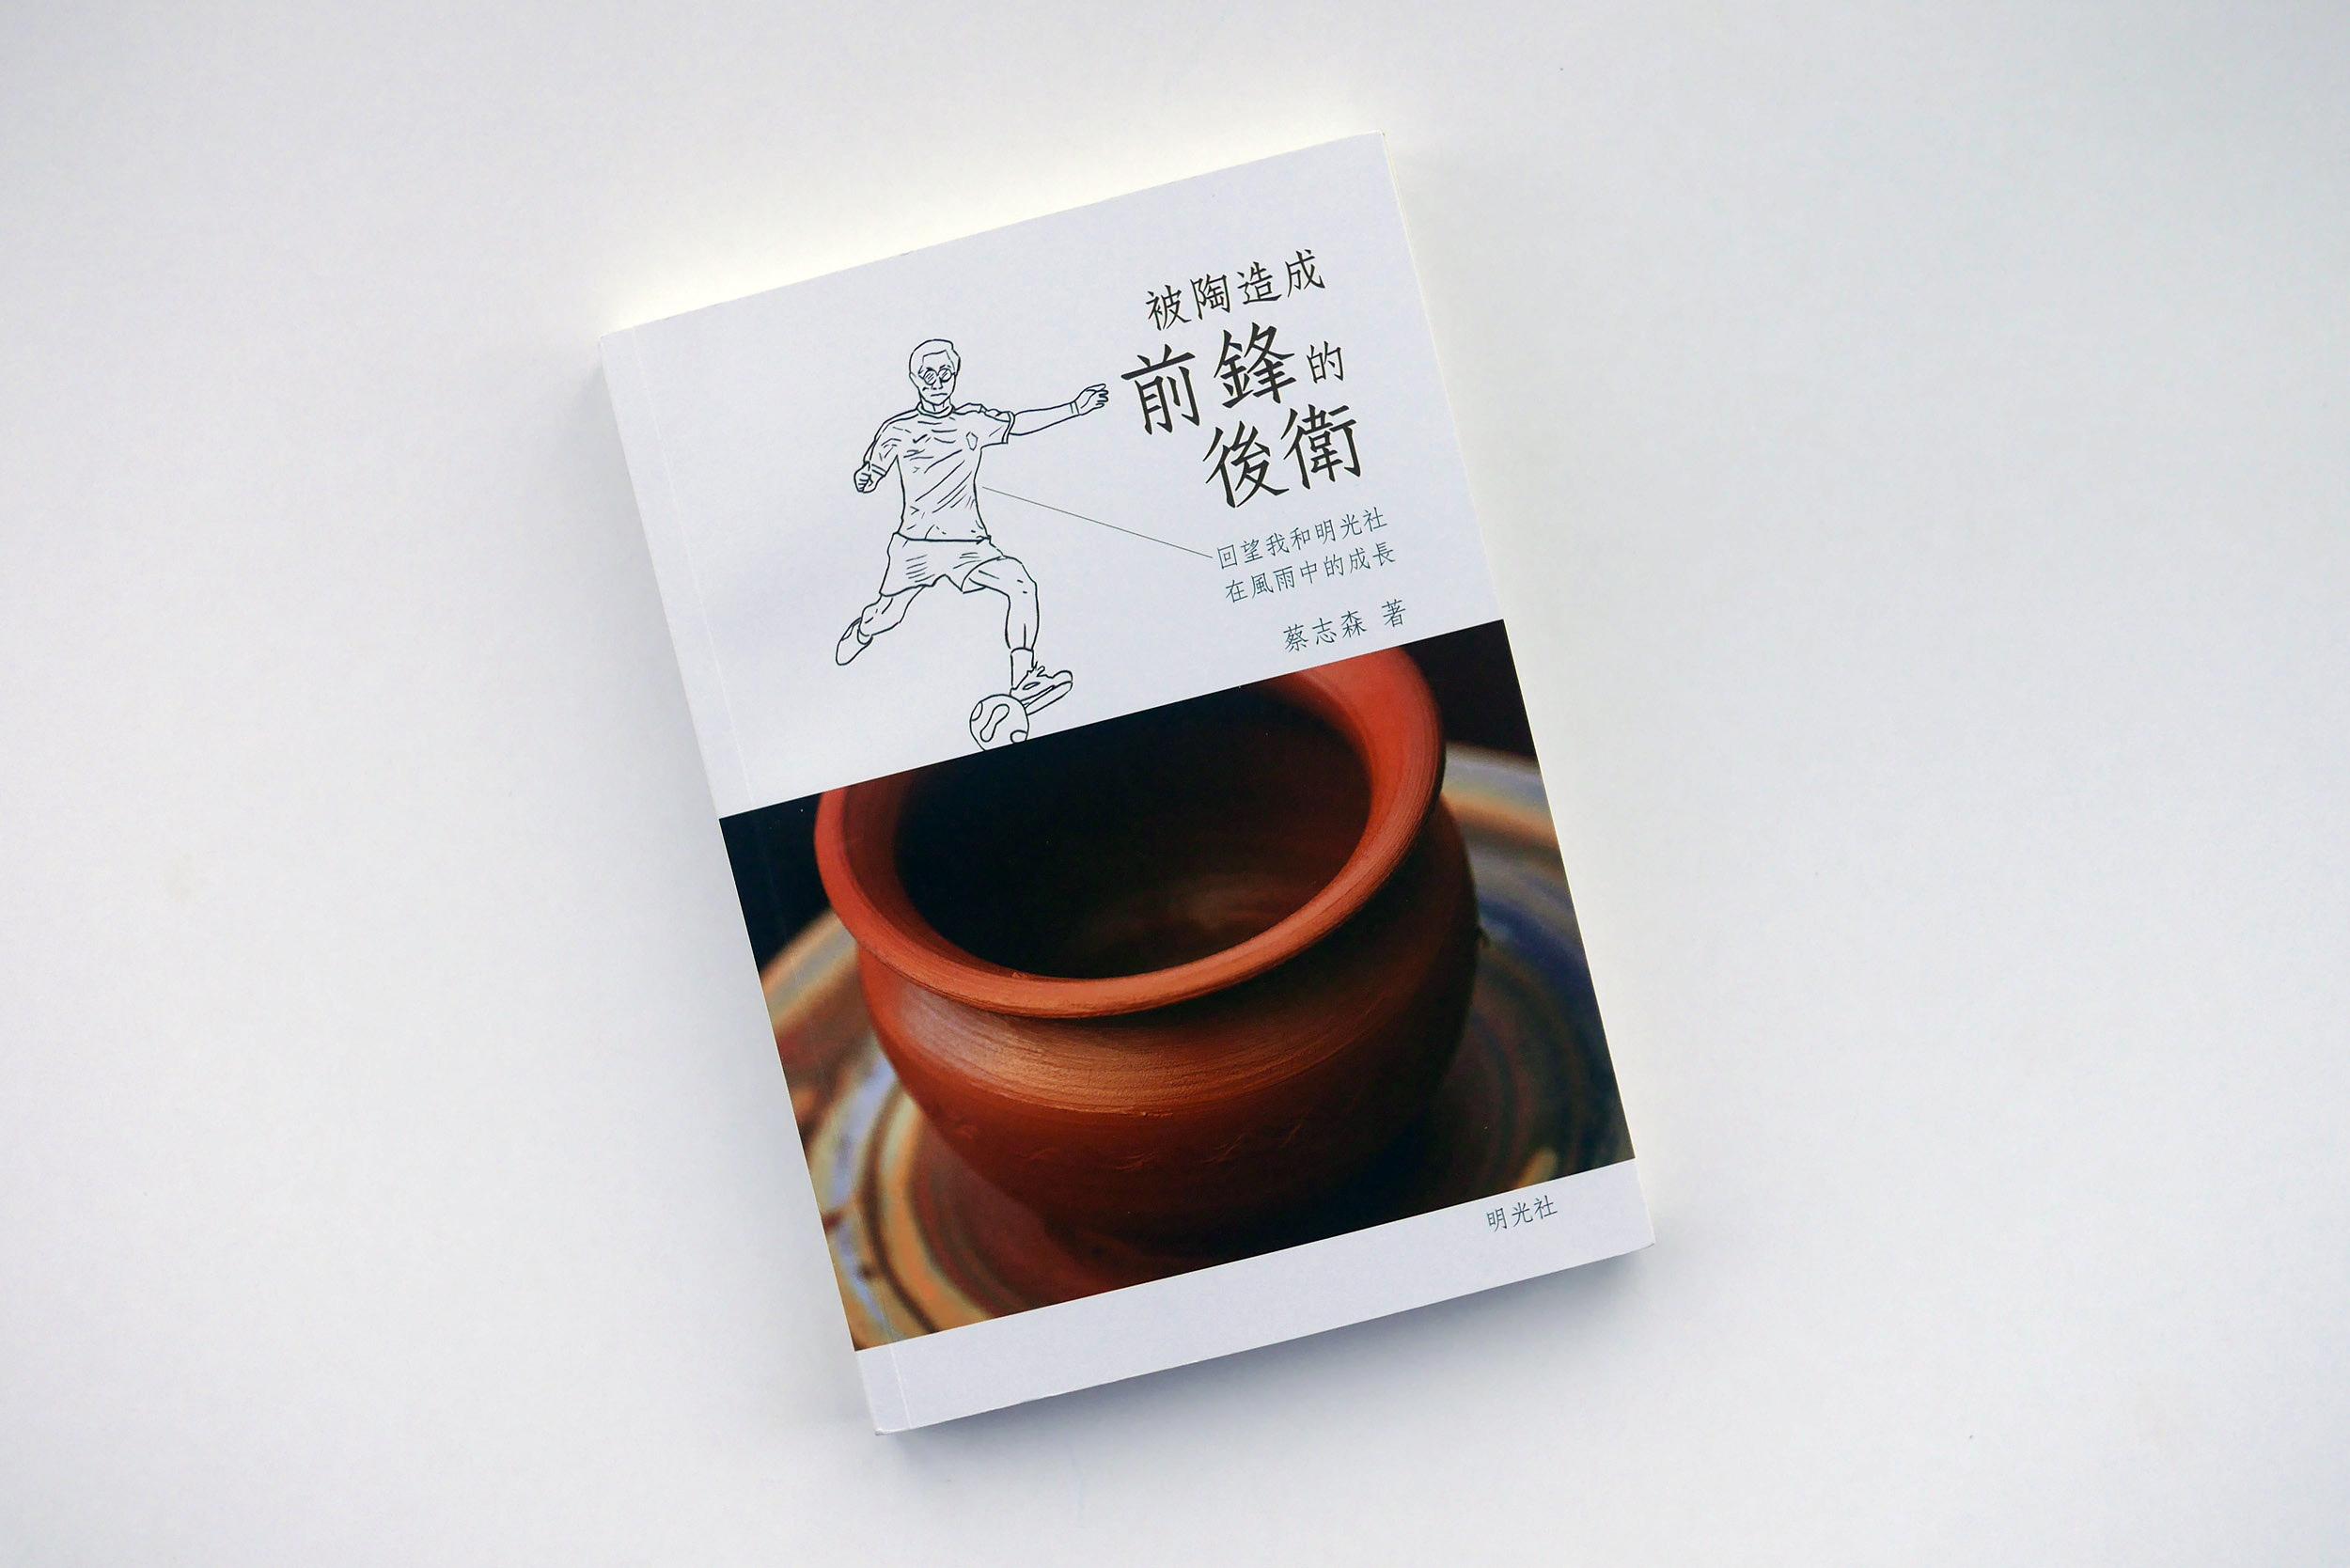 book 書籍  | 被陶造成前鋒的後衛